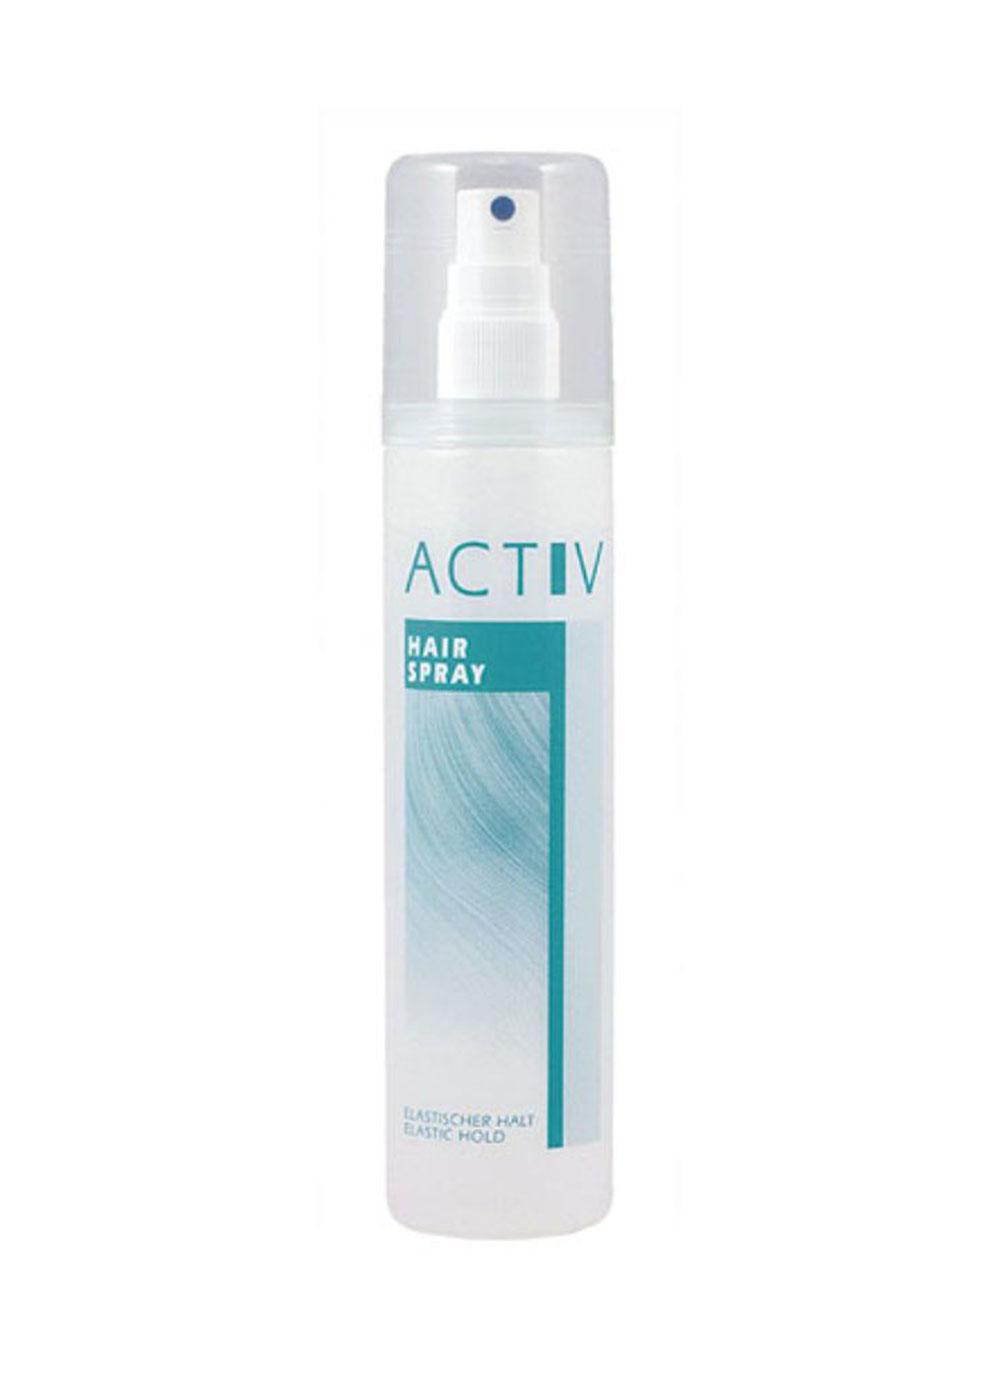 GFH Zubehör: ACTIV Hairspray 200ml